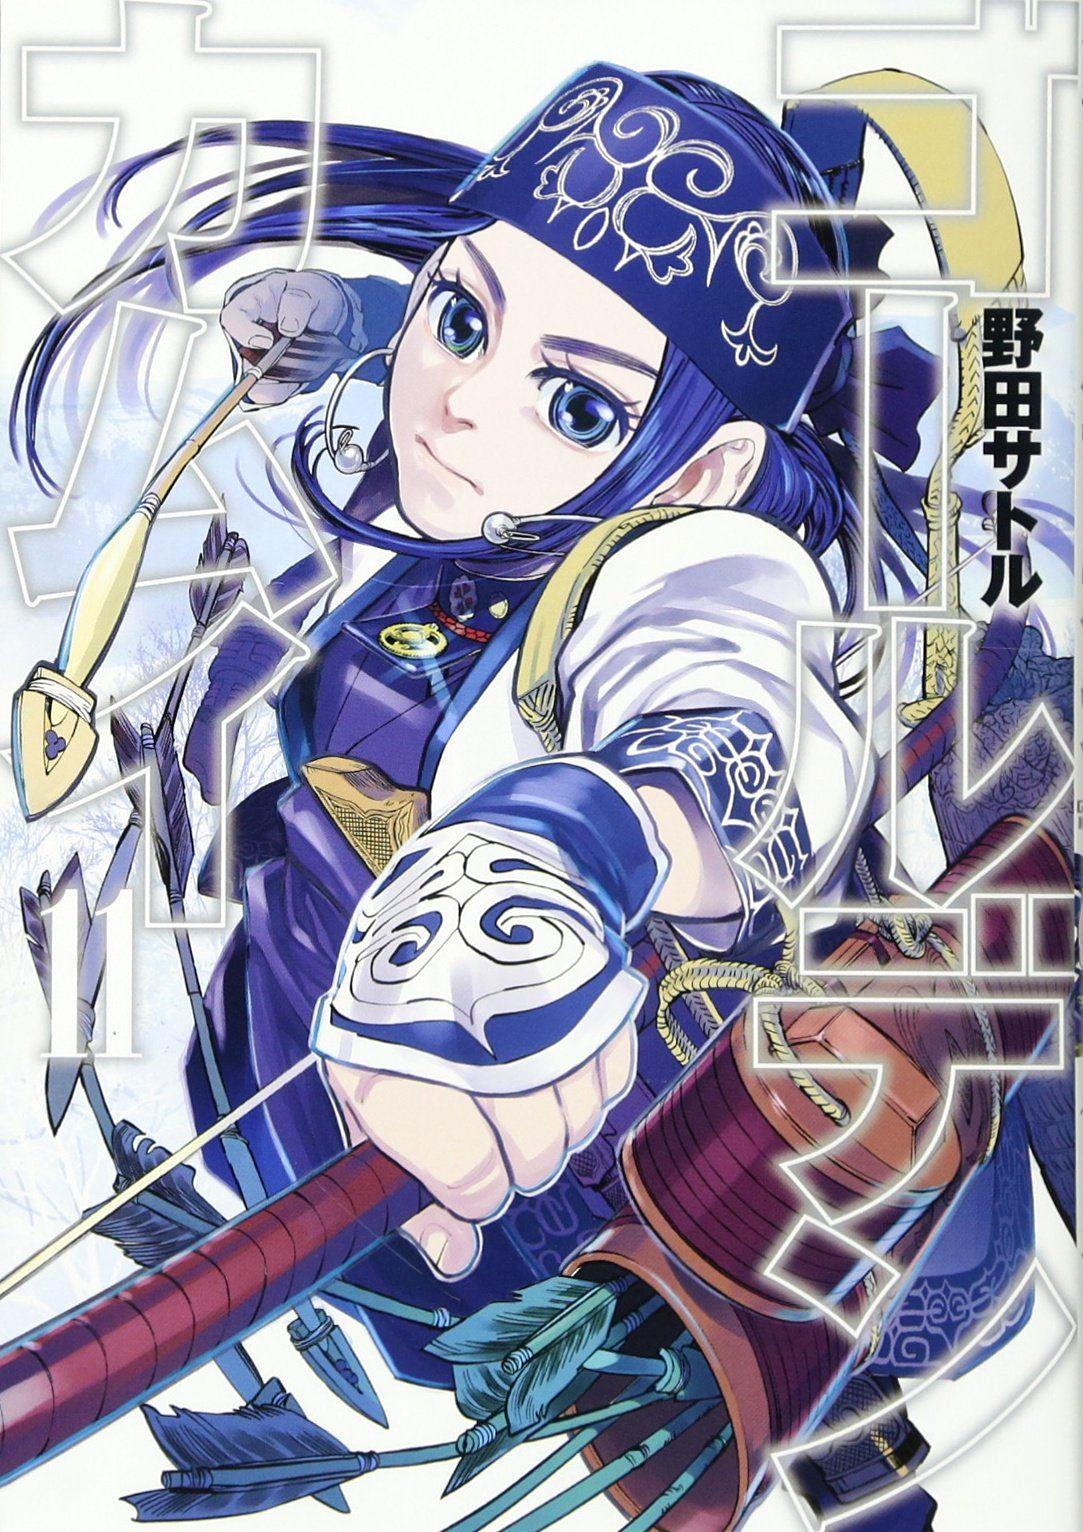 Golden Kamuy Anime, Anime wallpaper, Anime characters